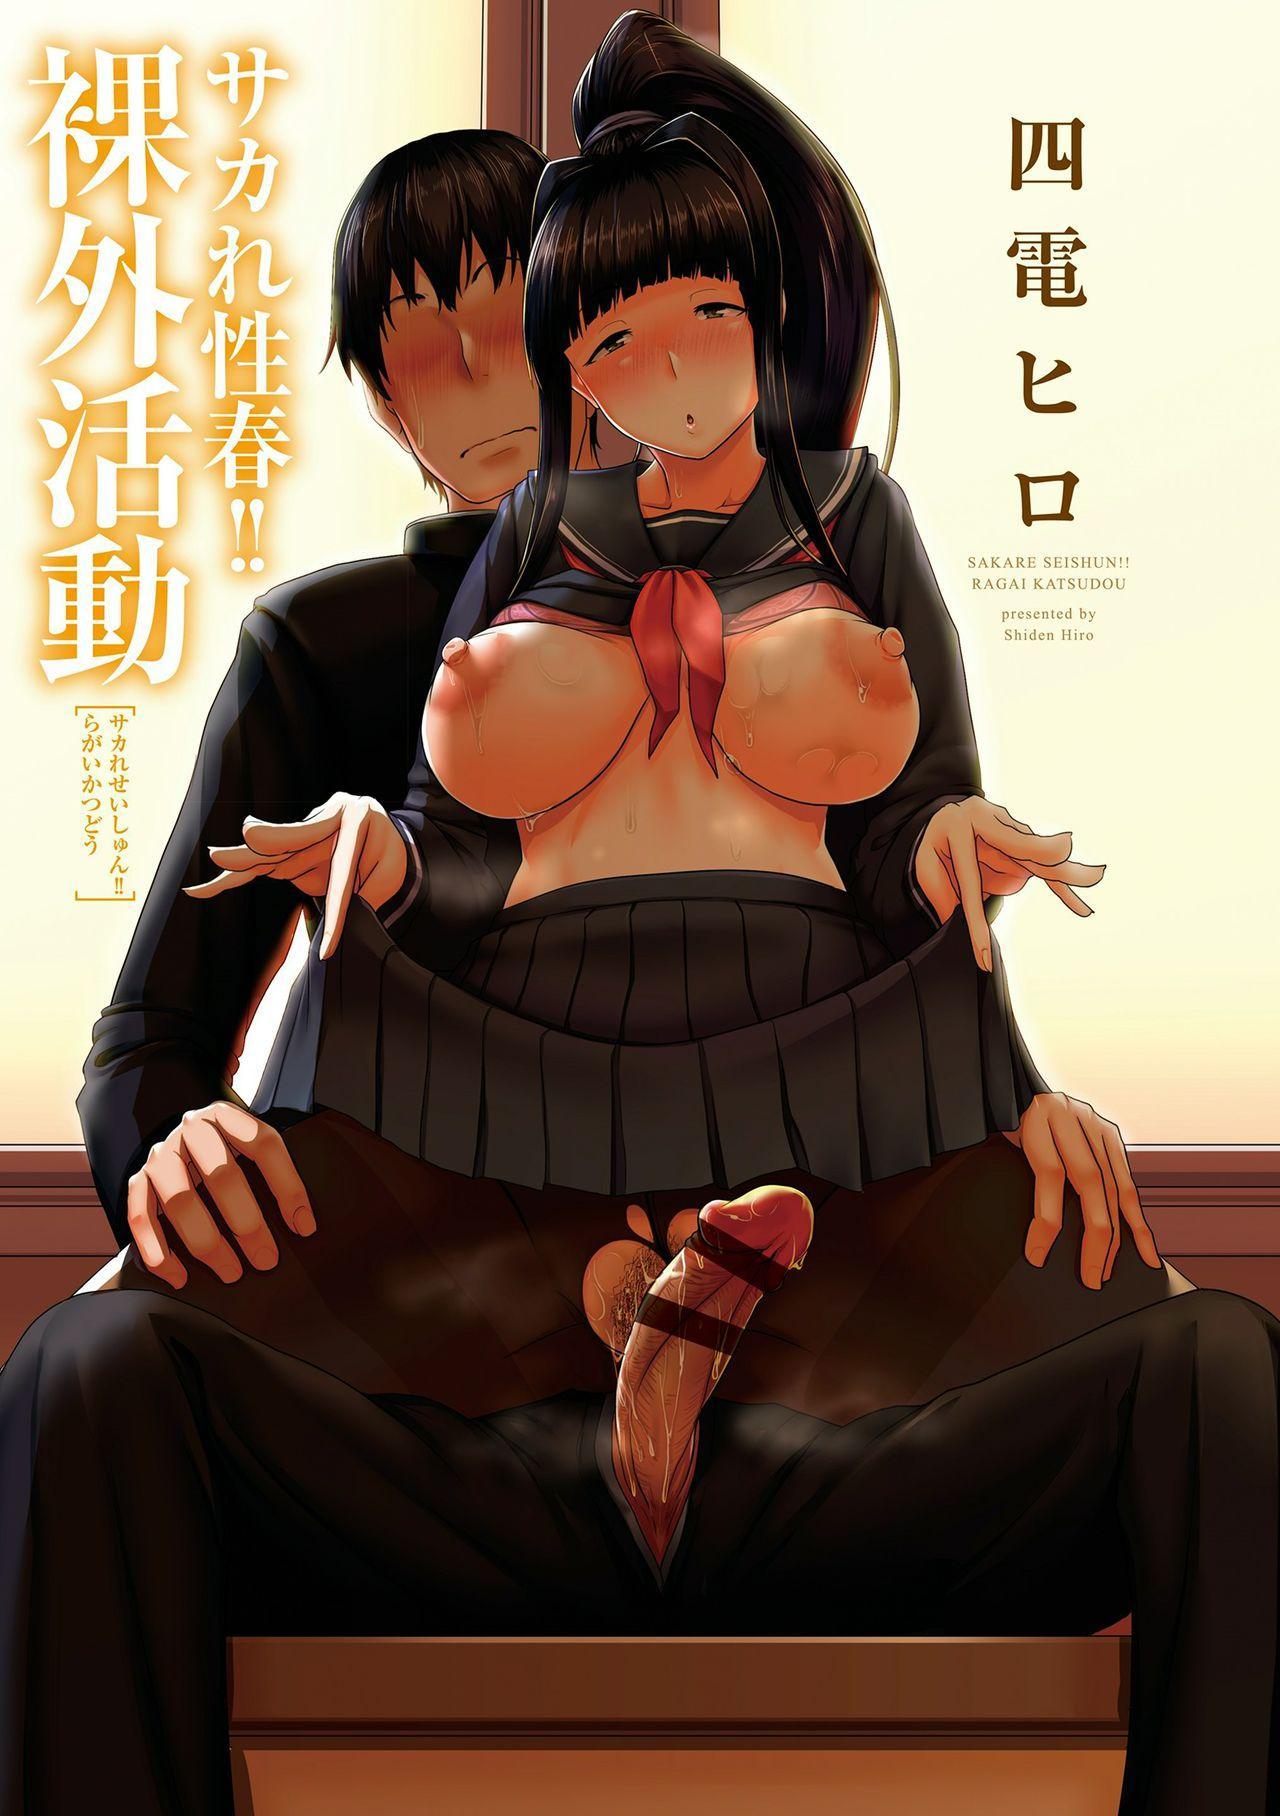 Sakare Seishun!! Ragai Katsudou   Prospering Youth!! Nude Outdoor Exercises Ch. 1-3 1